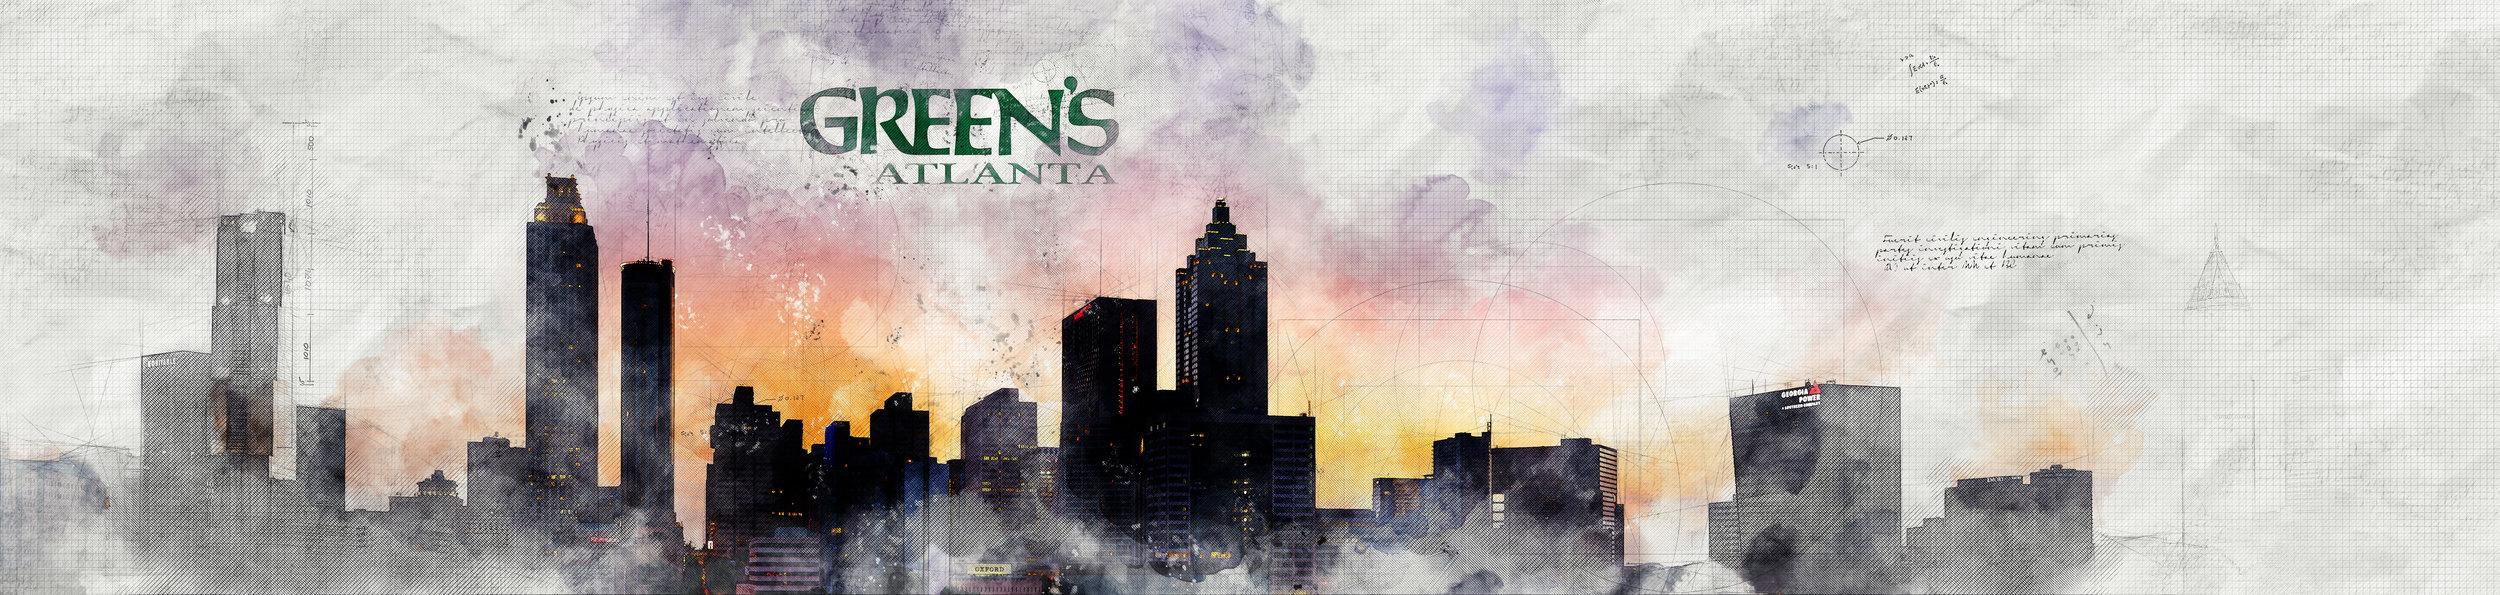 Atlanta_Downtown_Skyline 3.jpg